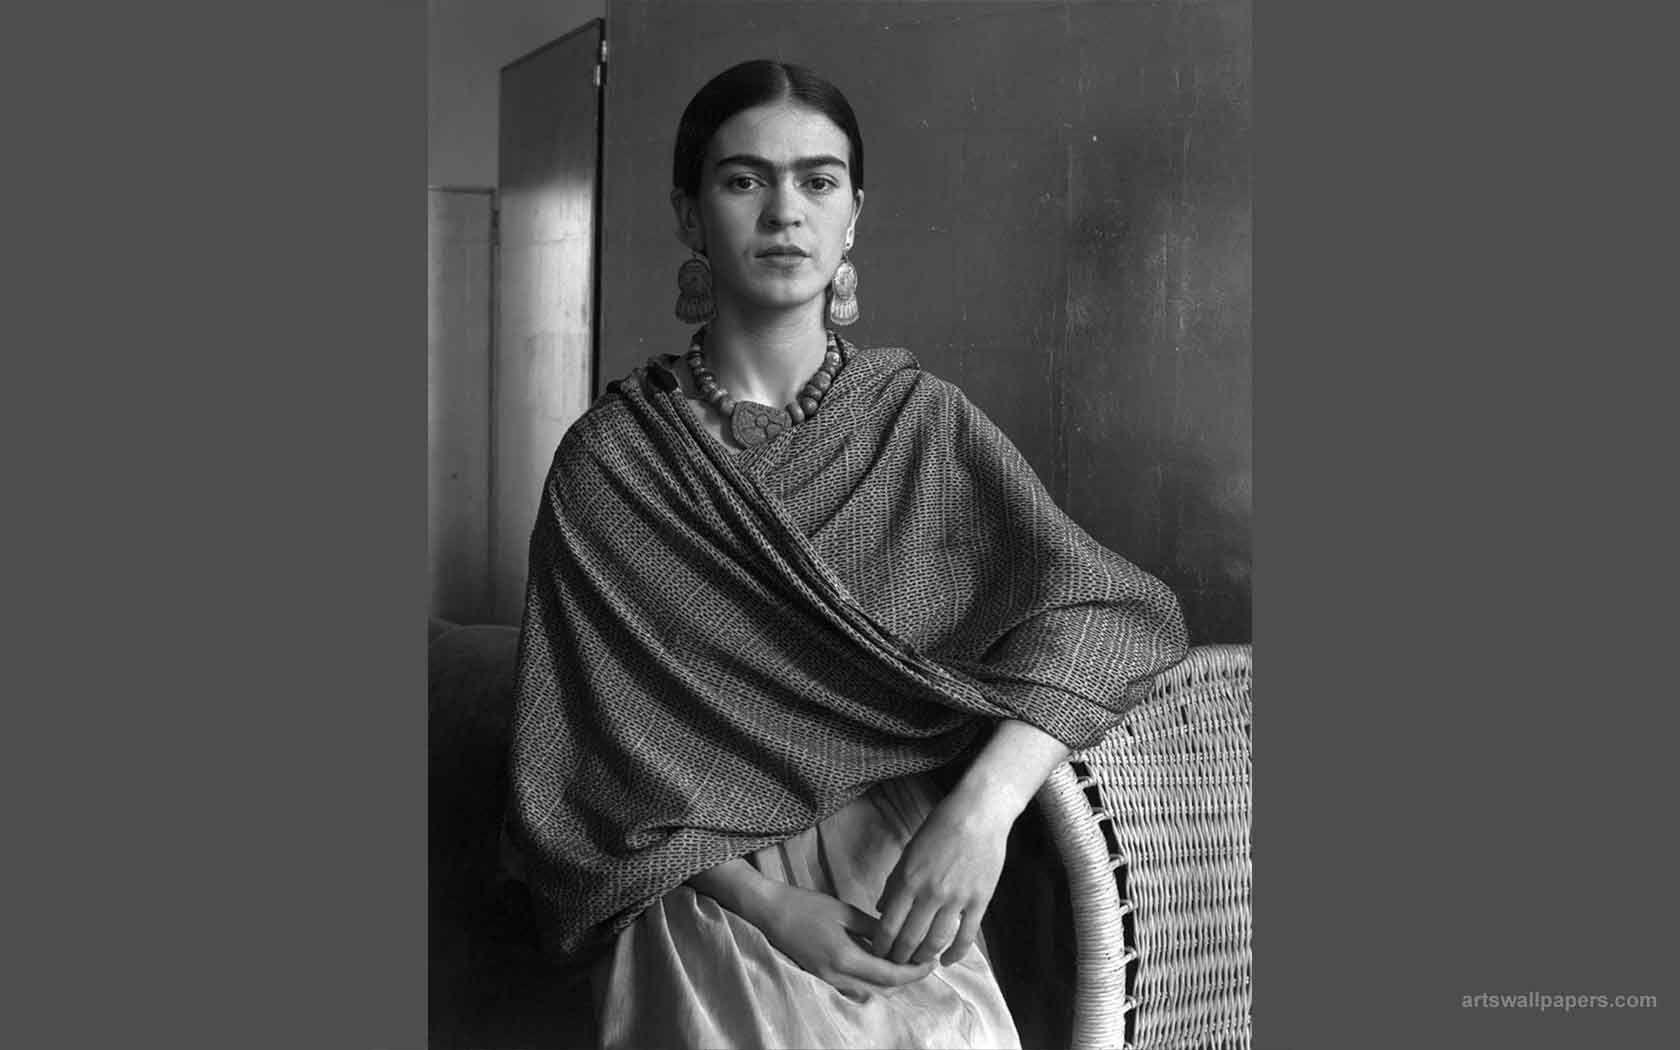 Image detail for -Frida Kahlo Wallpaper, Paintings, Art Wallpapers, Desktop